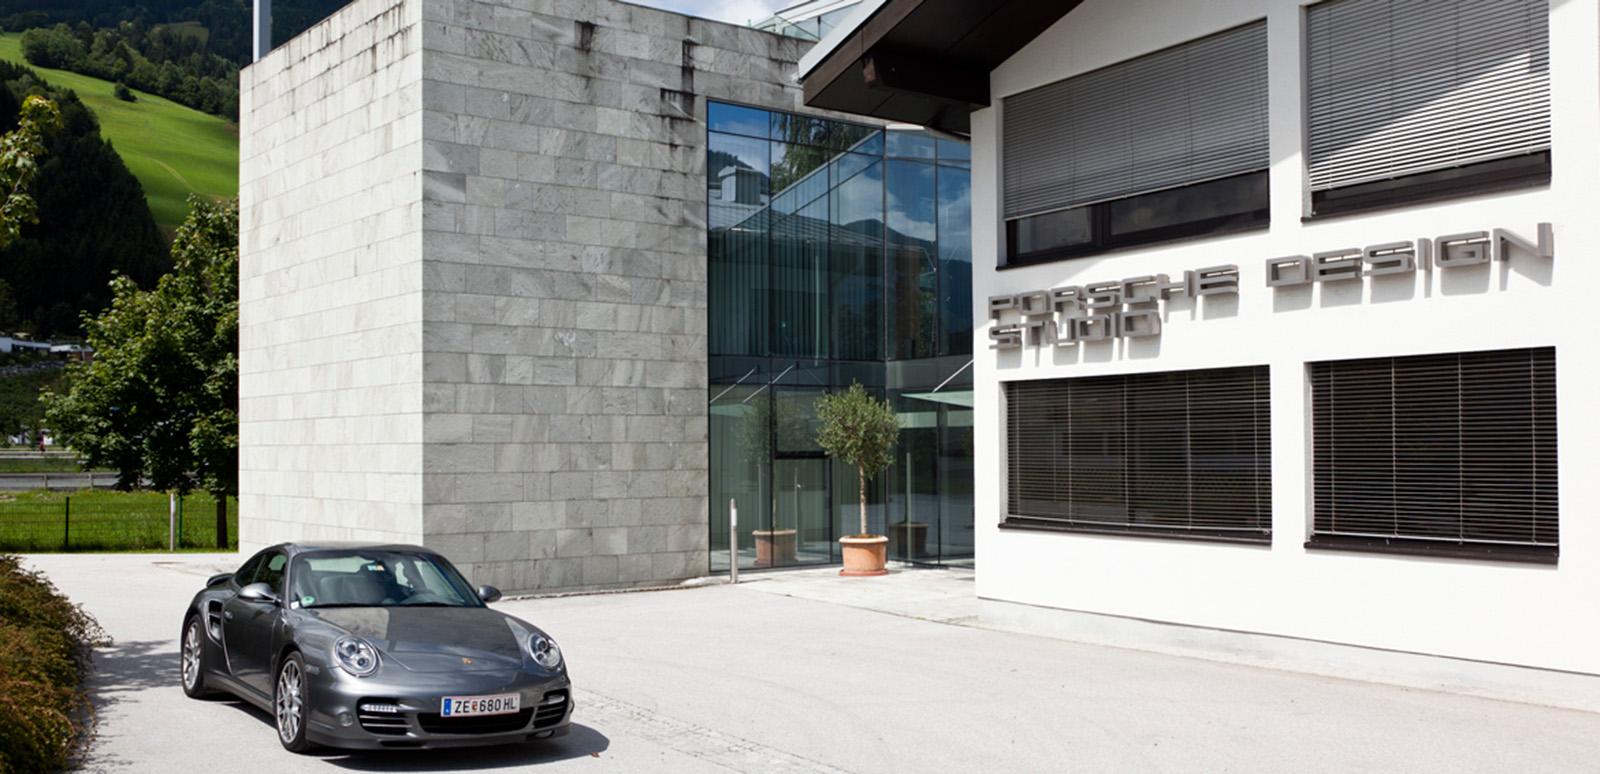 Porsche Design Studio, Zell am See (Austria)